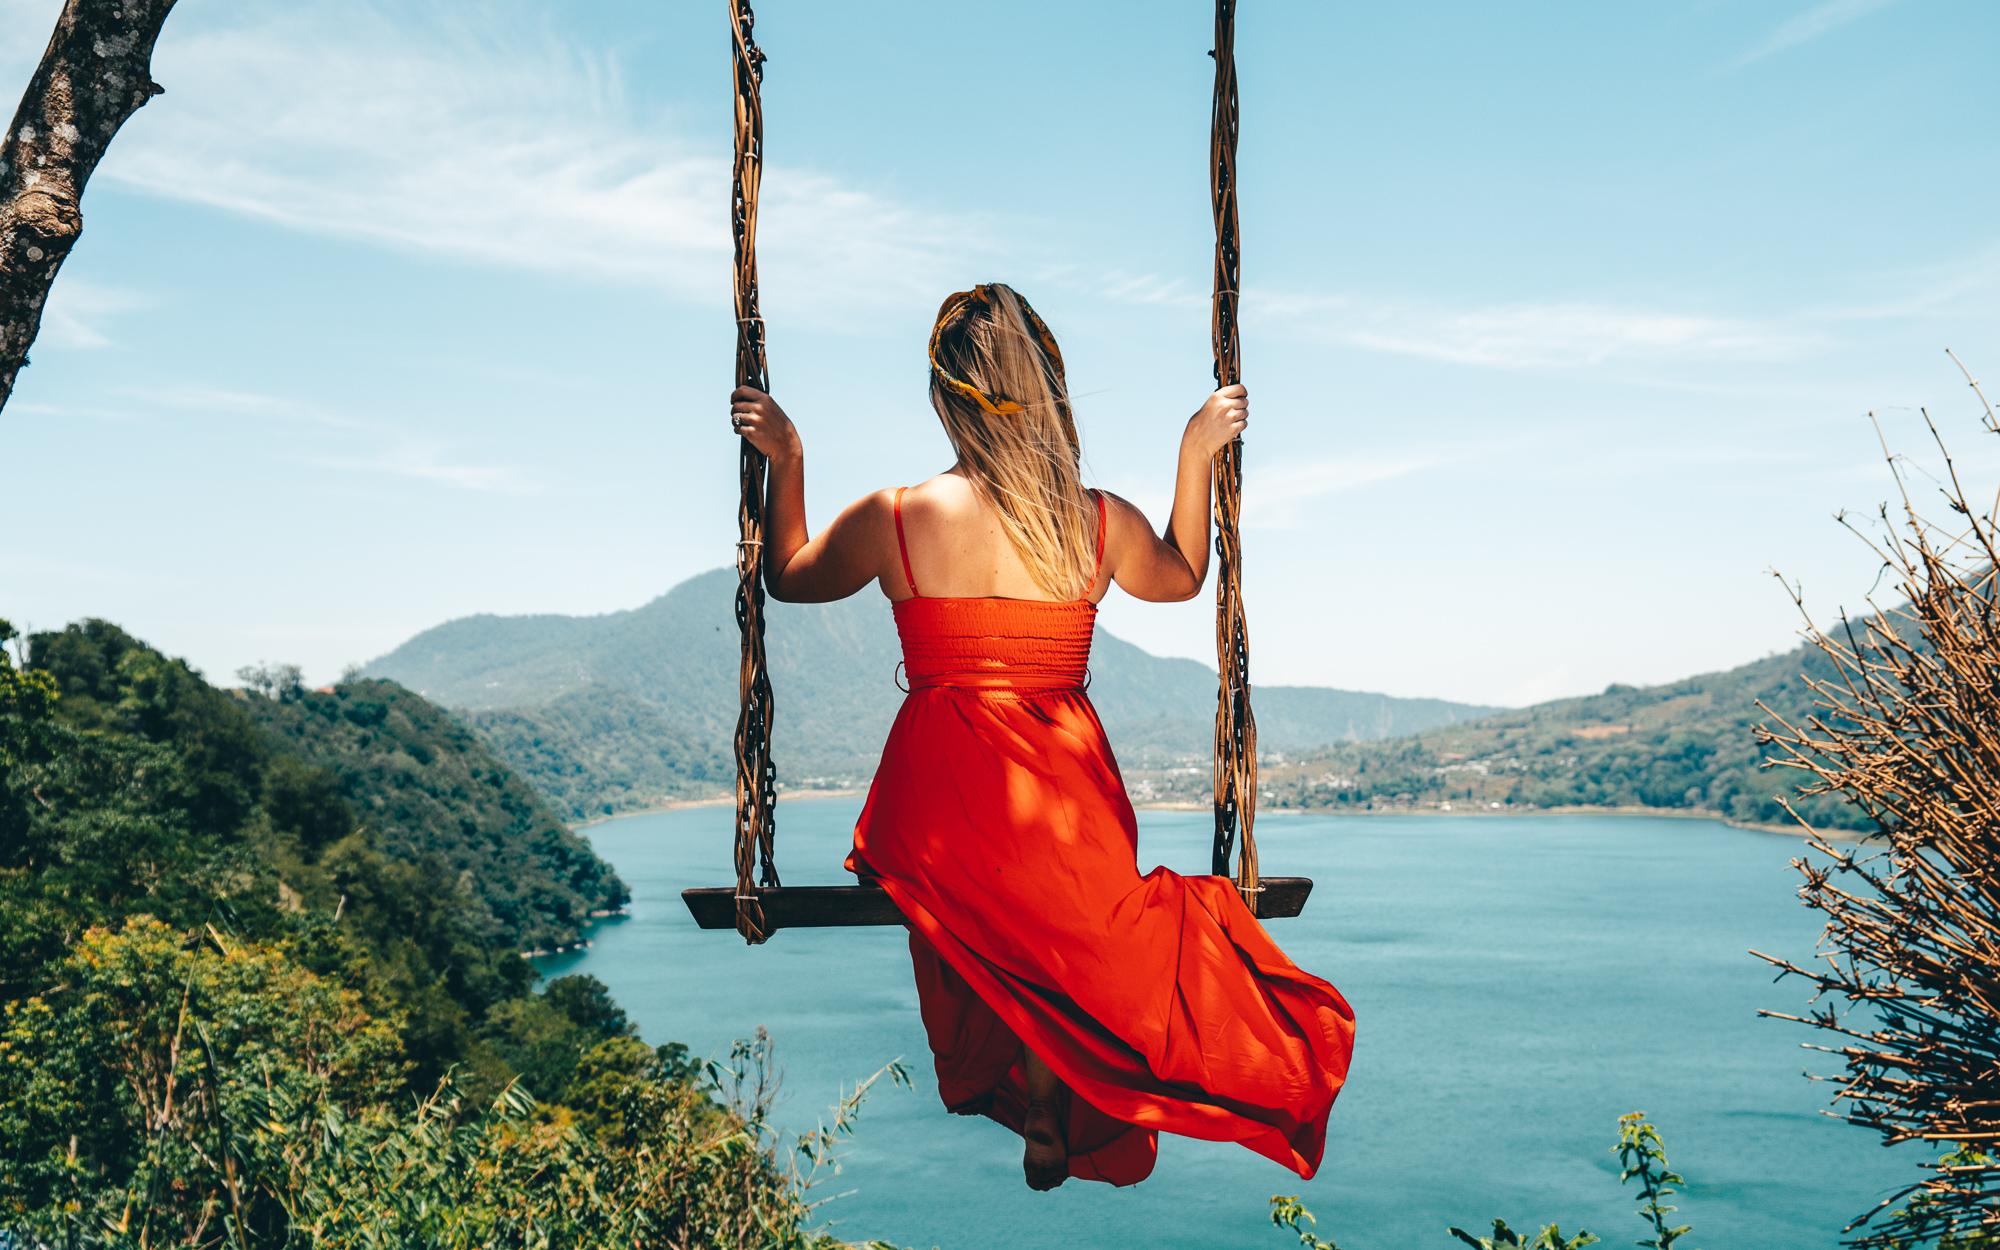 Wanagiri Hidden Hills Bali S Famous Swing Instagram Spots